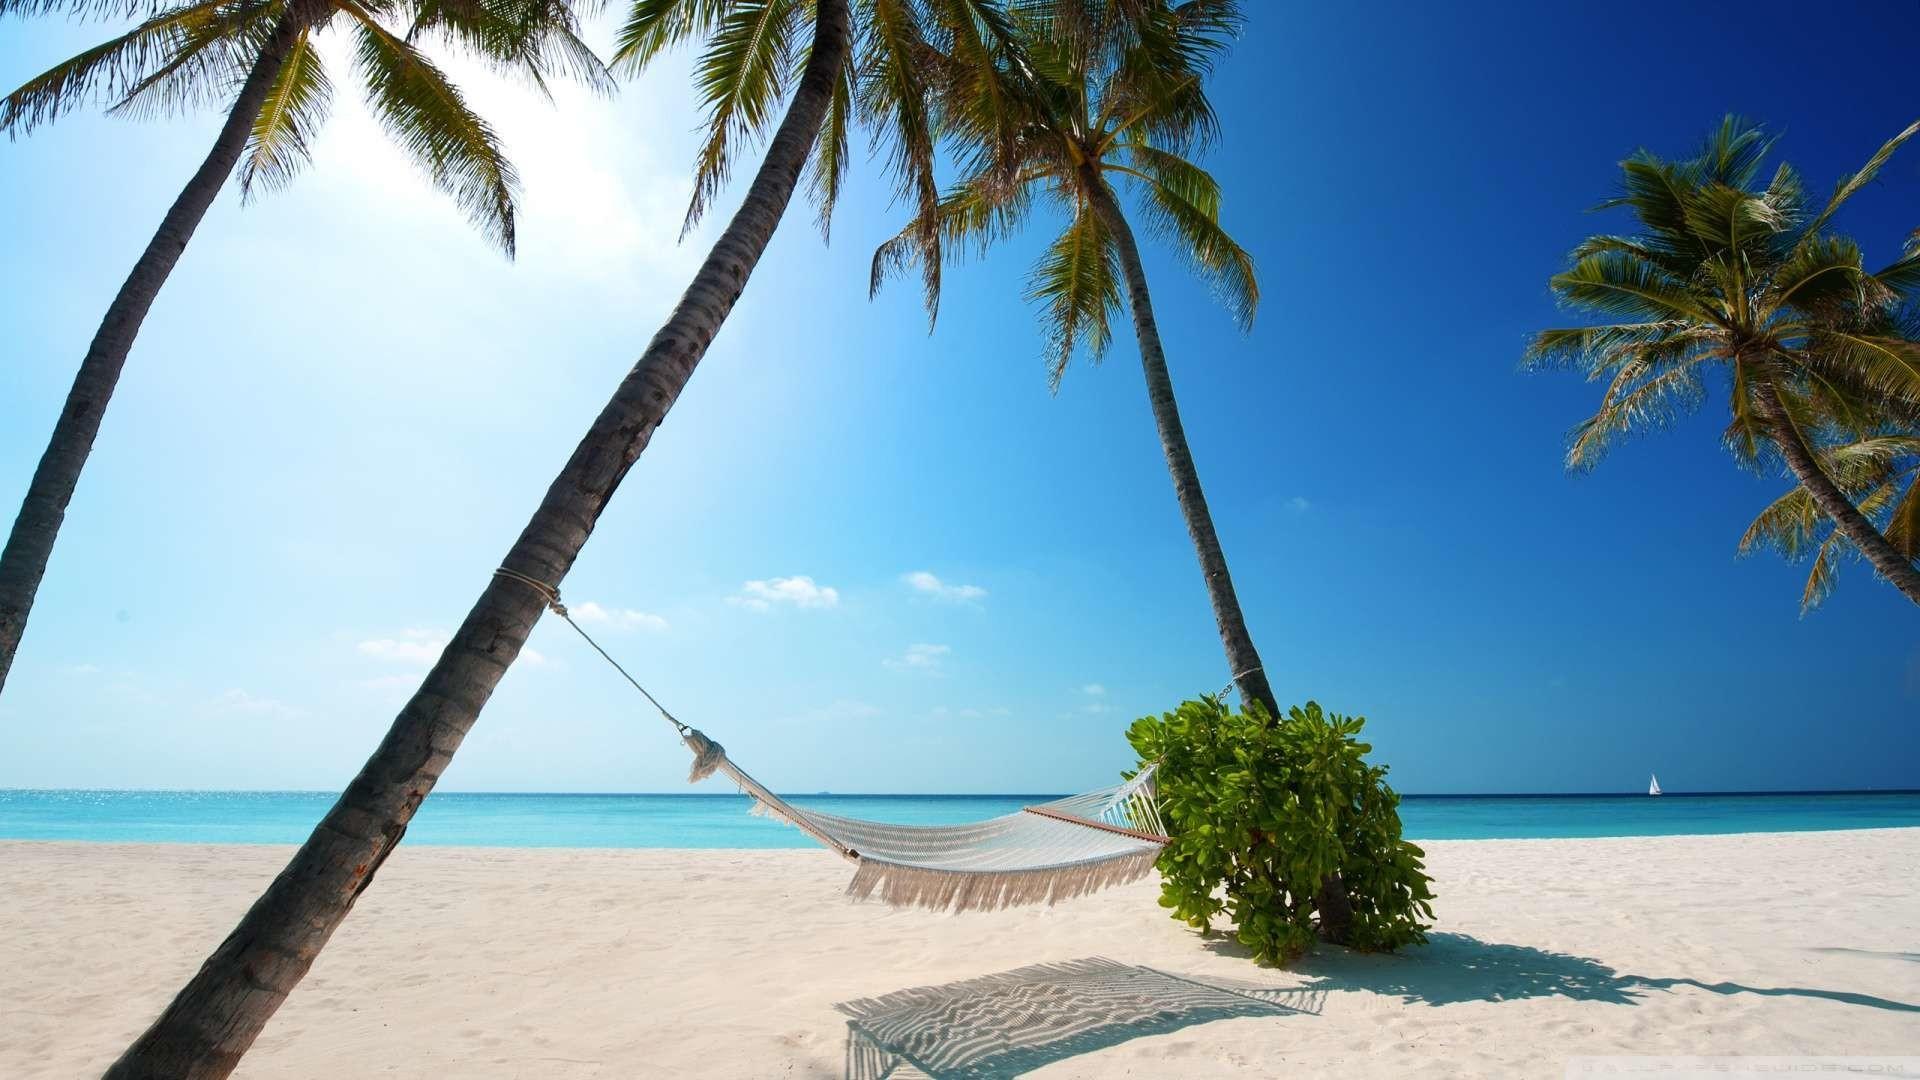 Wallpaper: Hammock On Tropical Beach Wallpaper 1080p HD. Upload at .